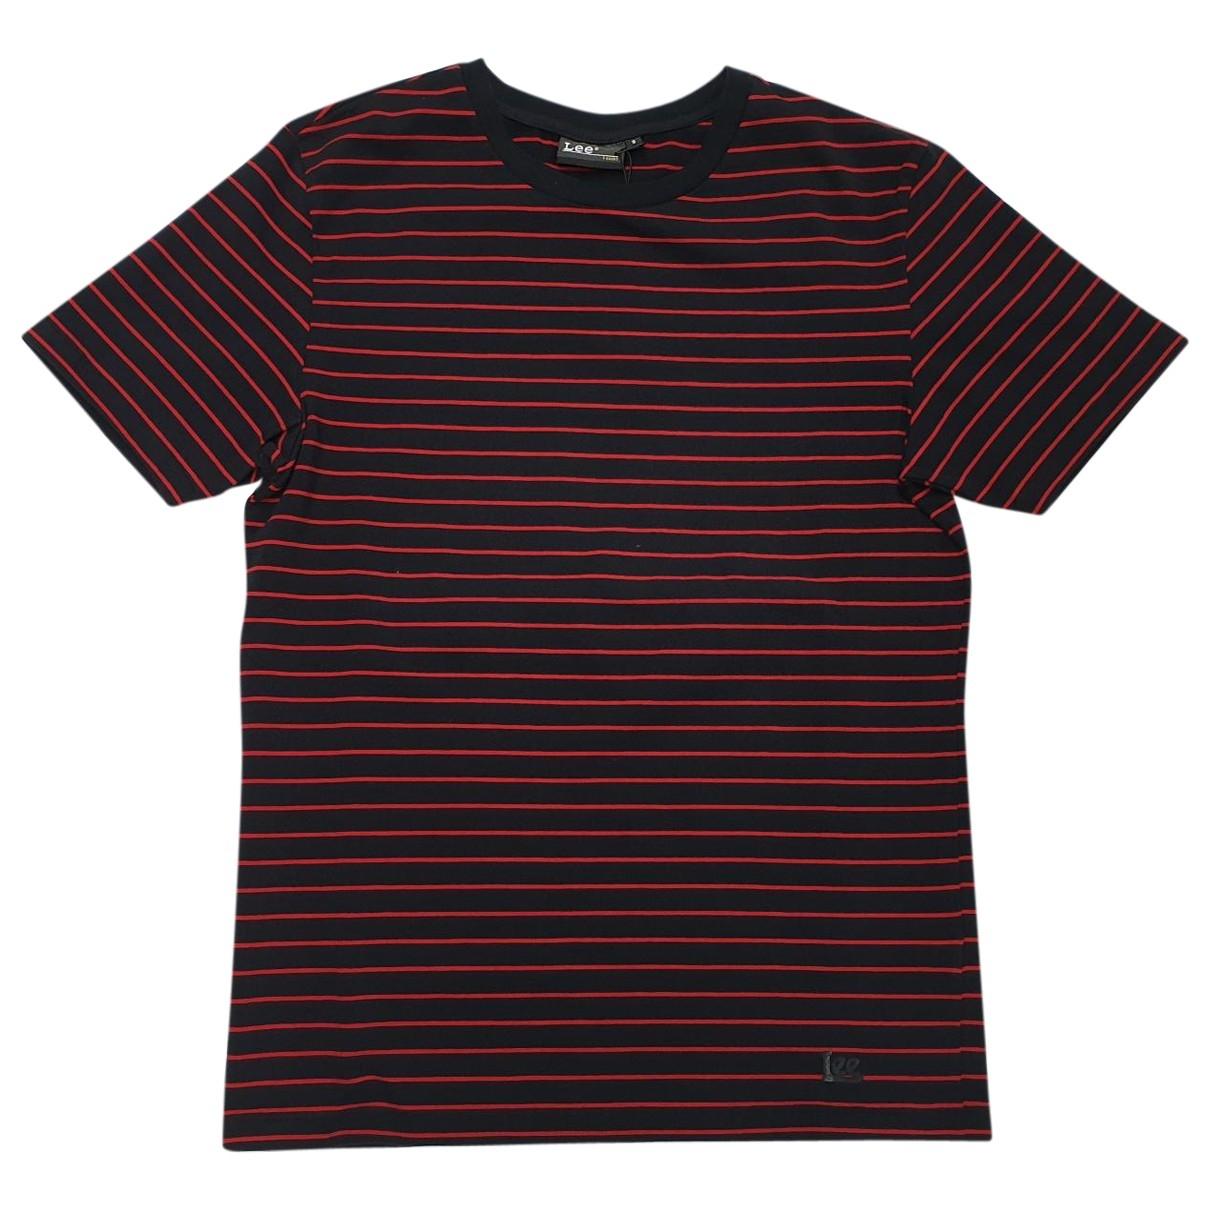 Lee \N Black Cotton T-shirts for Men S International